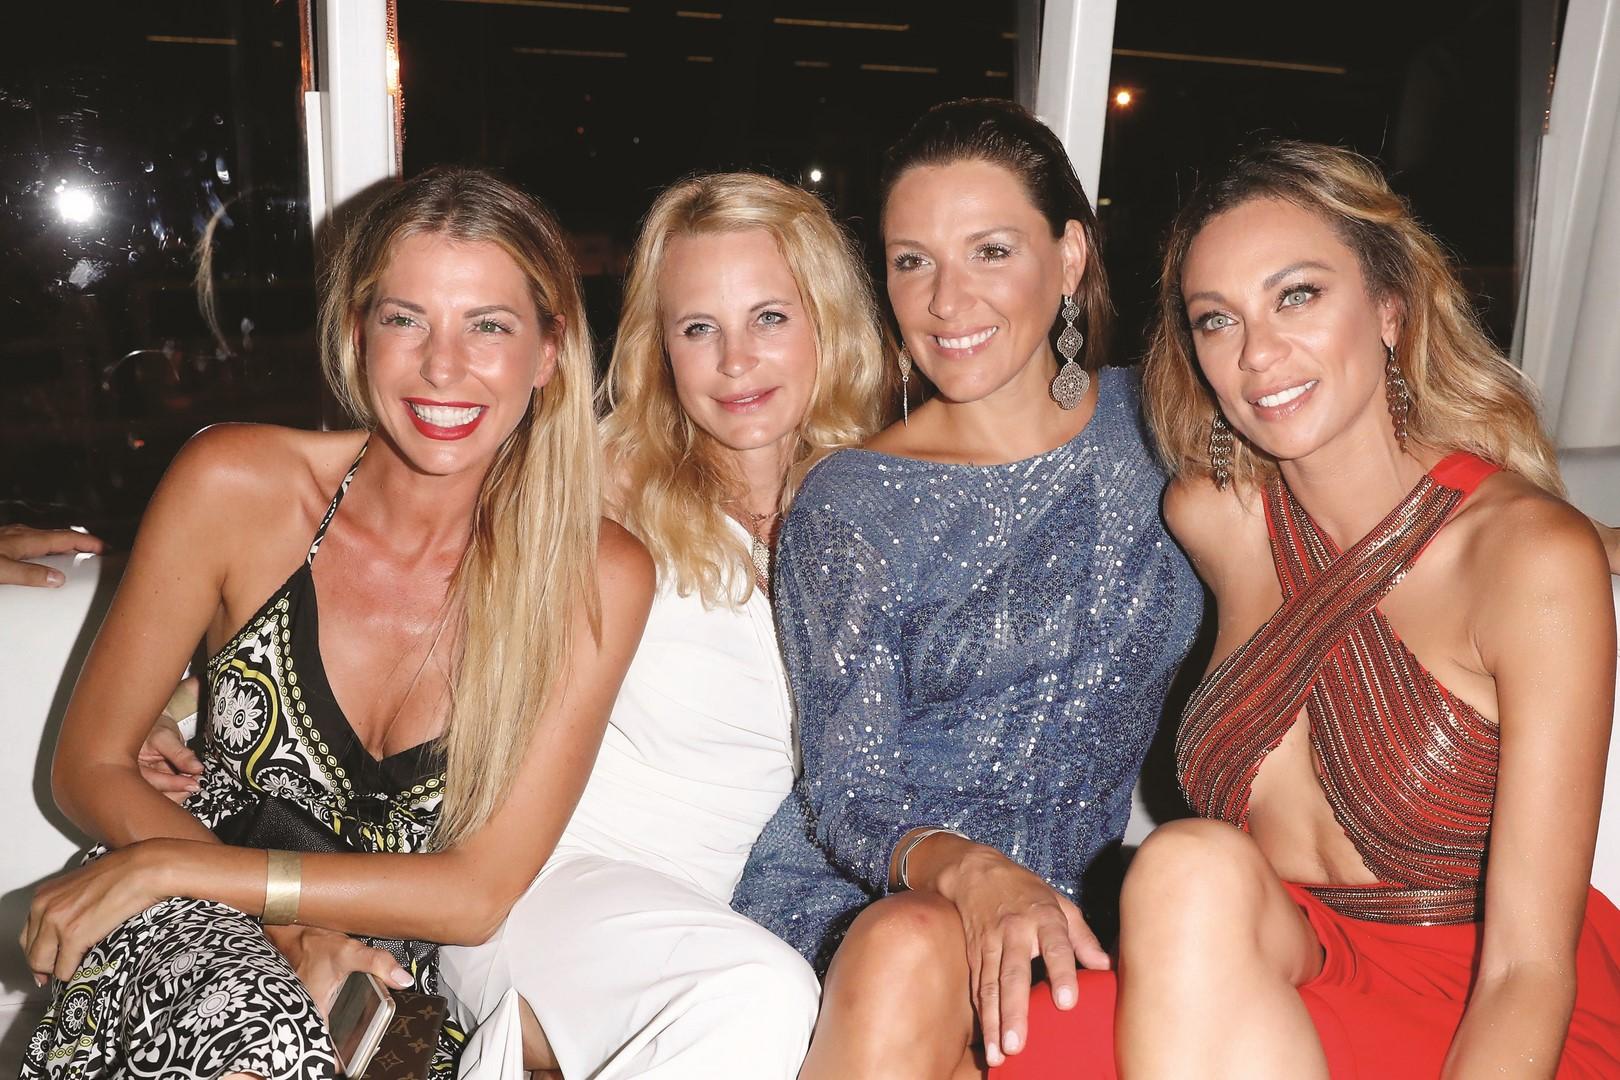 Remus Lifestyle Night Gäste: Giulia Siegel, Sonja Kiefer, Simone Ballack and Lilly Becker (Photo by Franziska Krug/Getty Images)